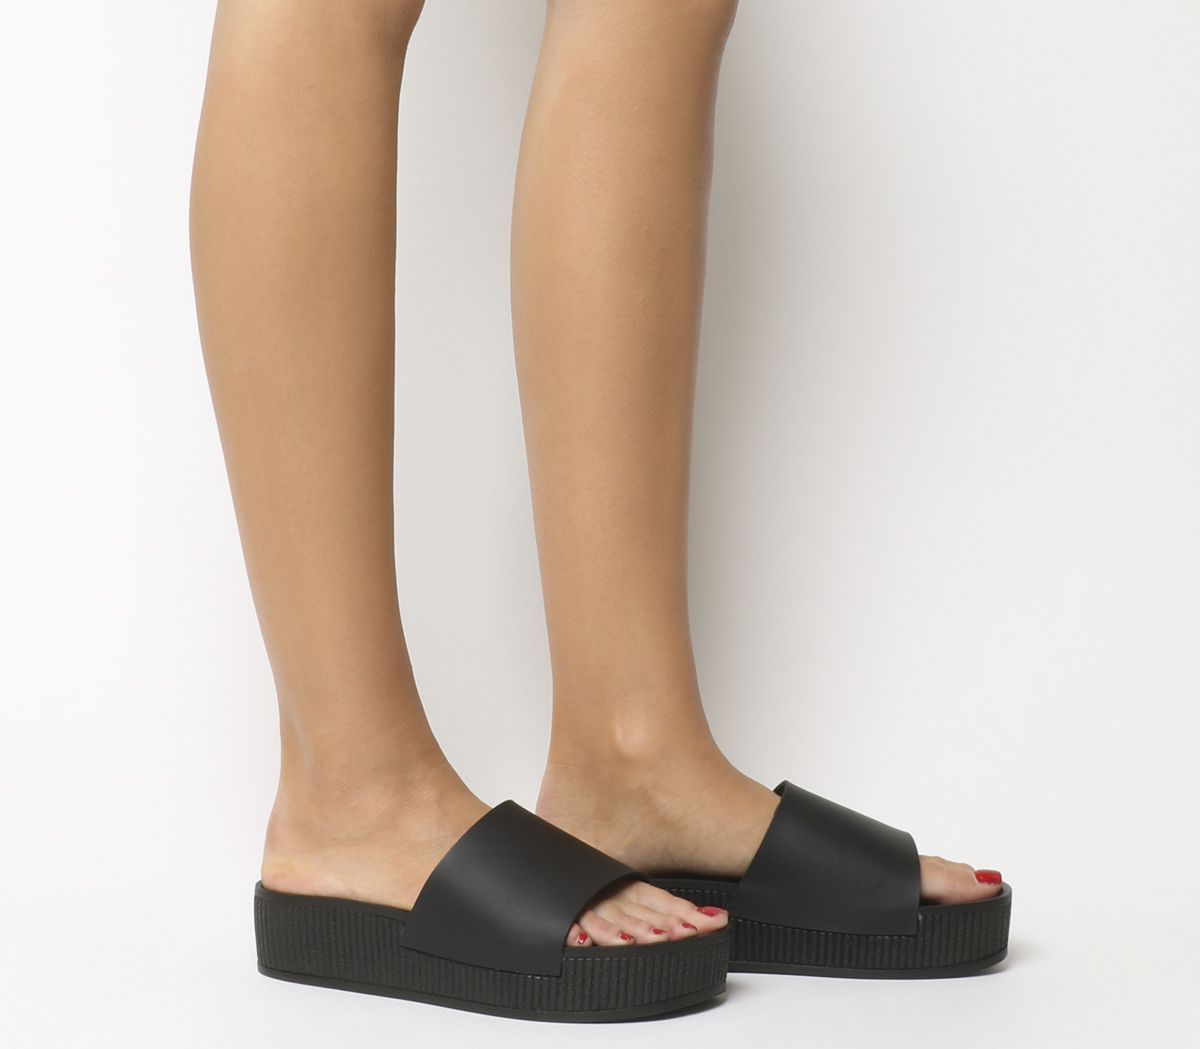 7a22137c6b Office Mushroom Flatform Sandals Black - Mid Heels